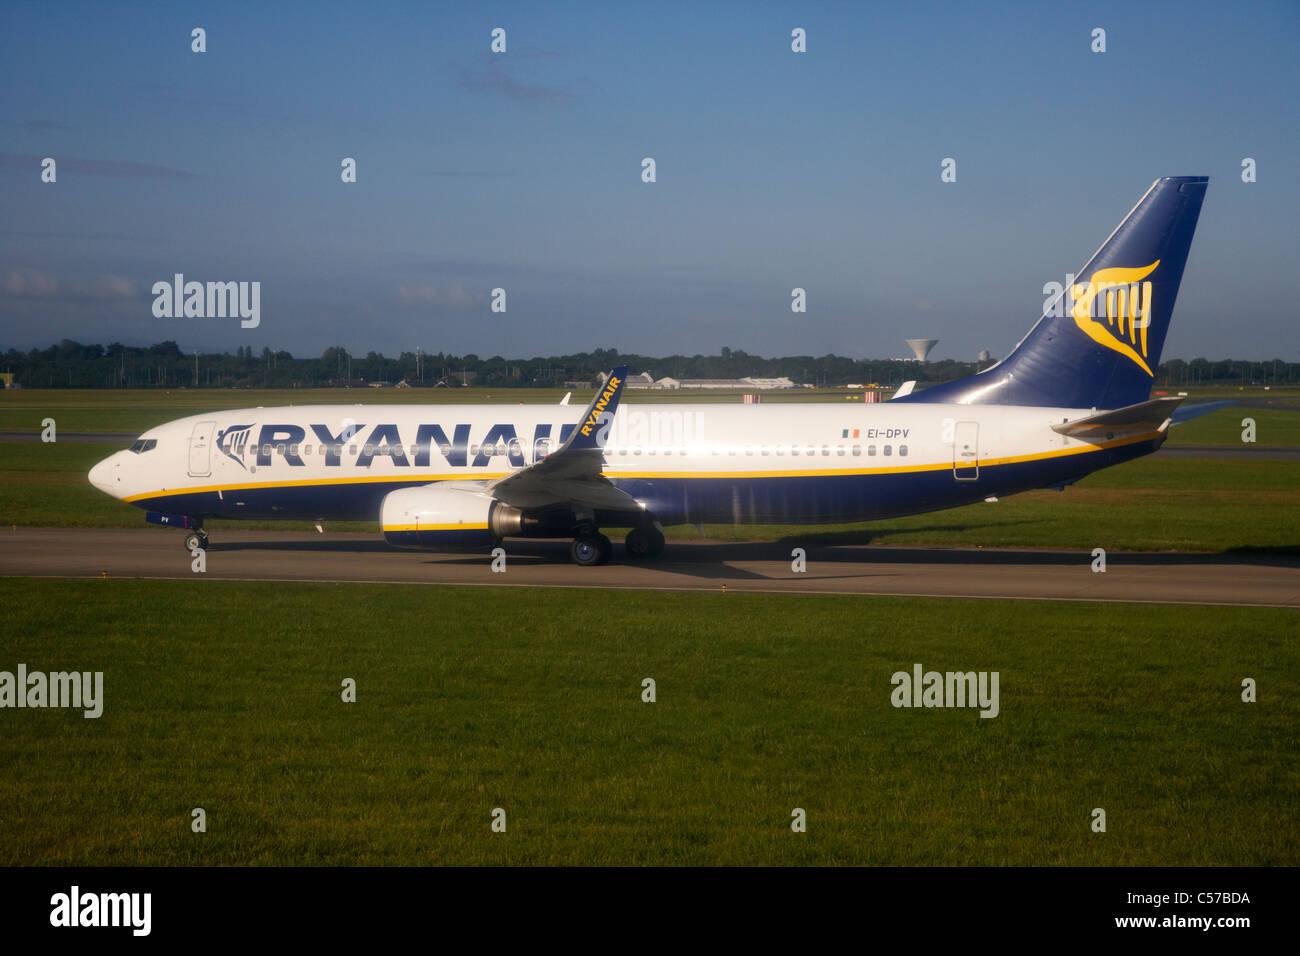 ryanair boeing 737 aircraft EI-DPV dublin airport republic of ireland europe shot through aircraft window - Stock Image